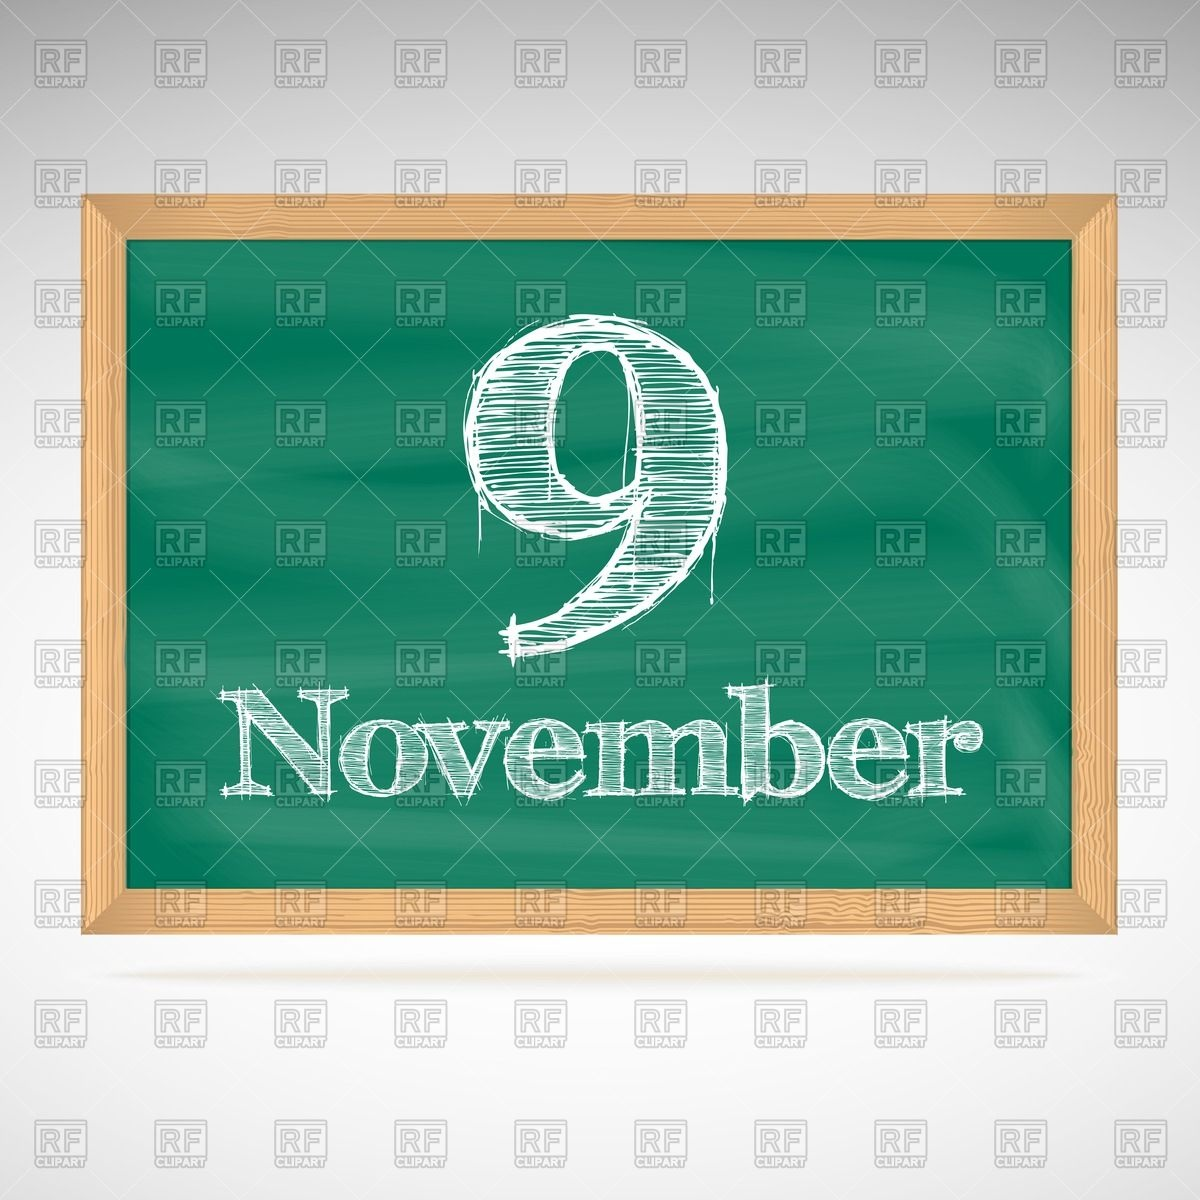 November 9th calendar clipart svg free stock School chalkboard calendar with inscription in chalk November 9 ... svg free stock